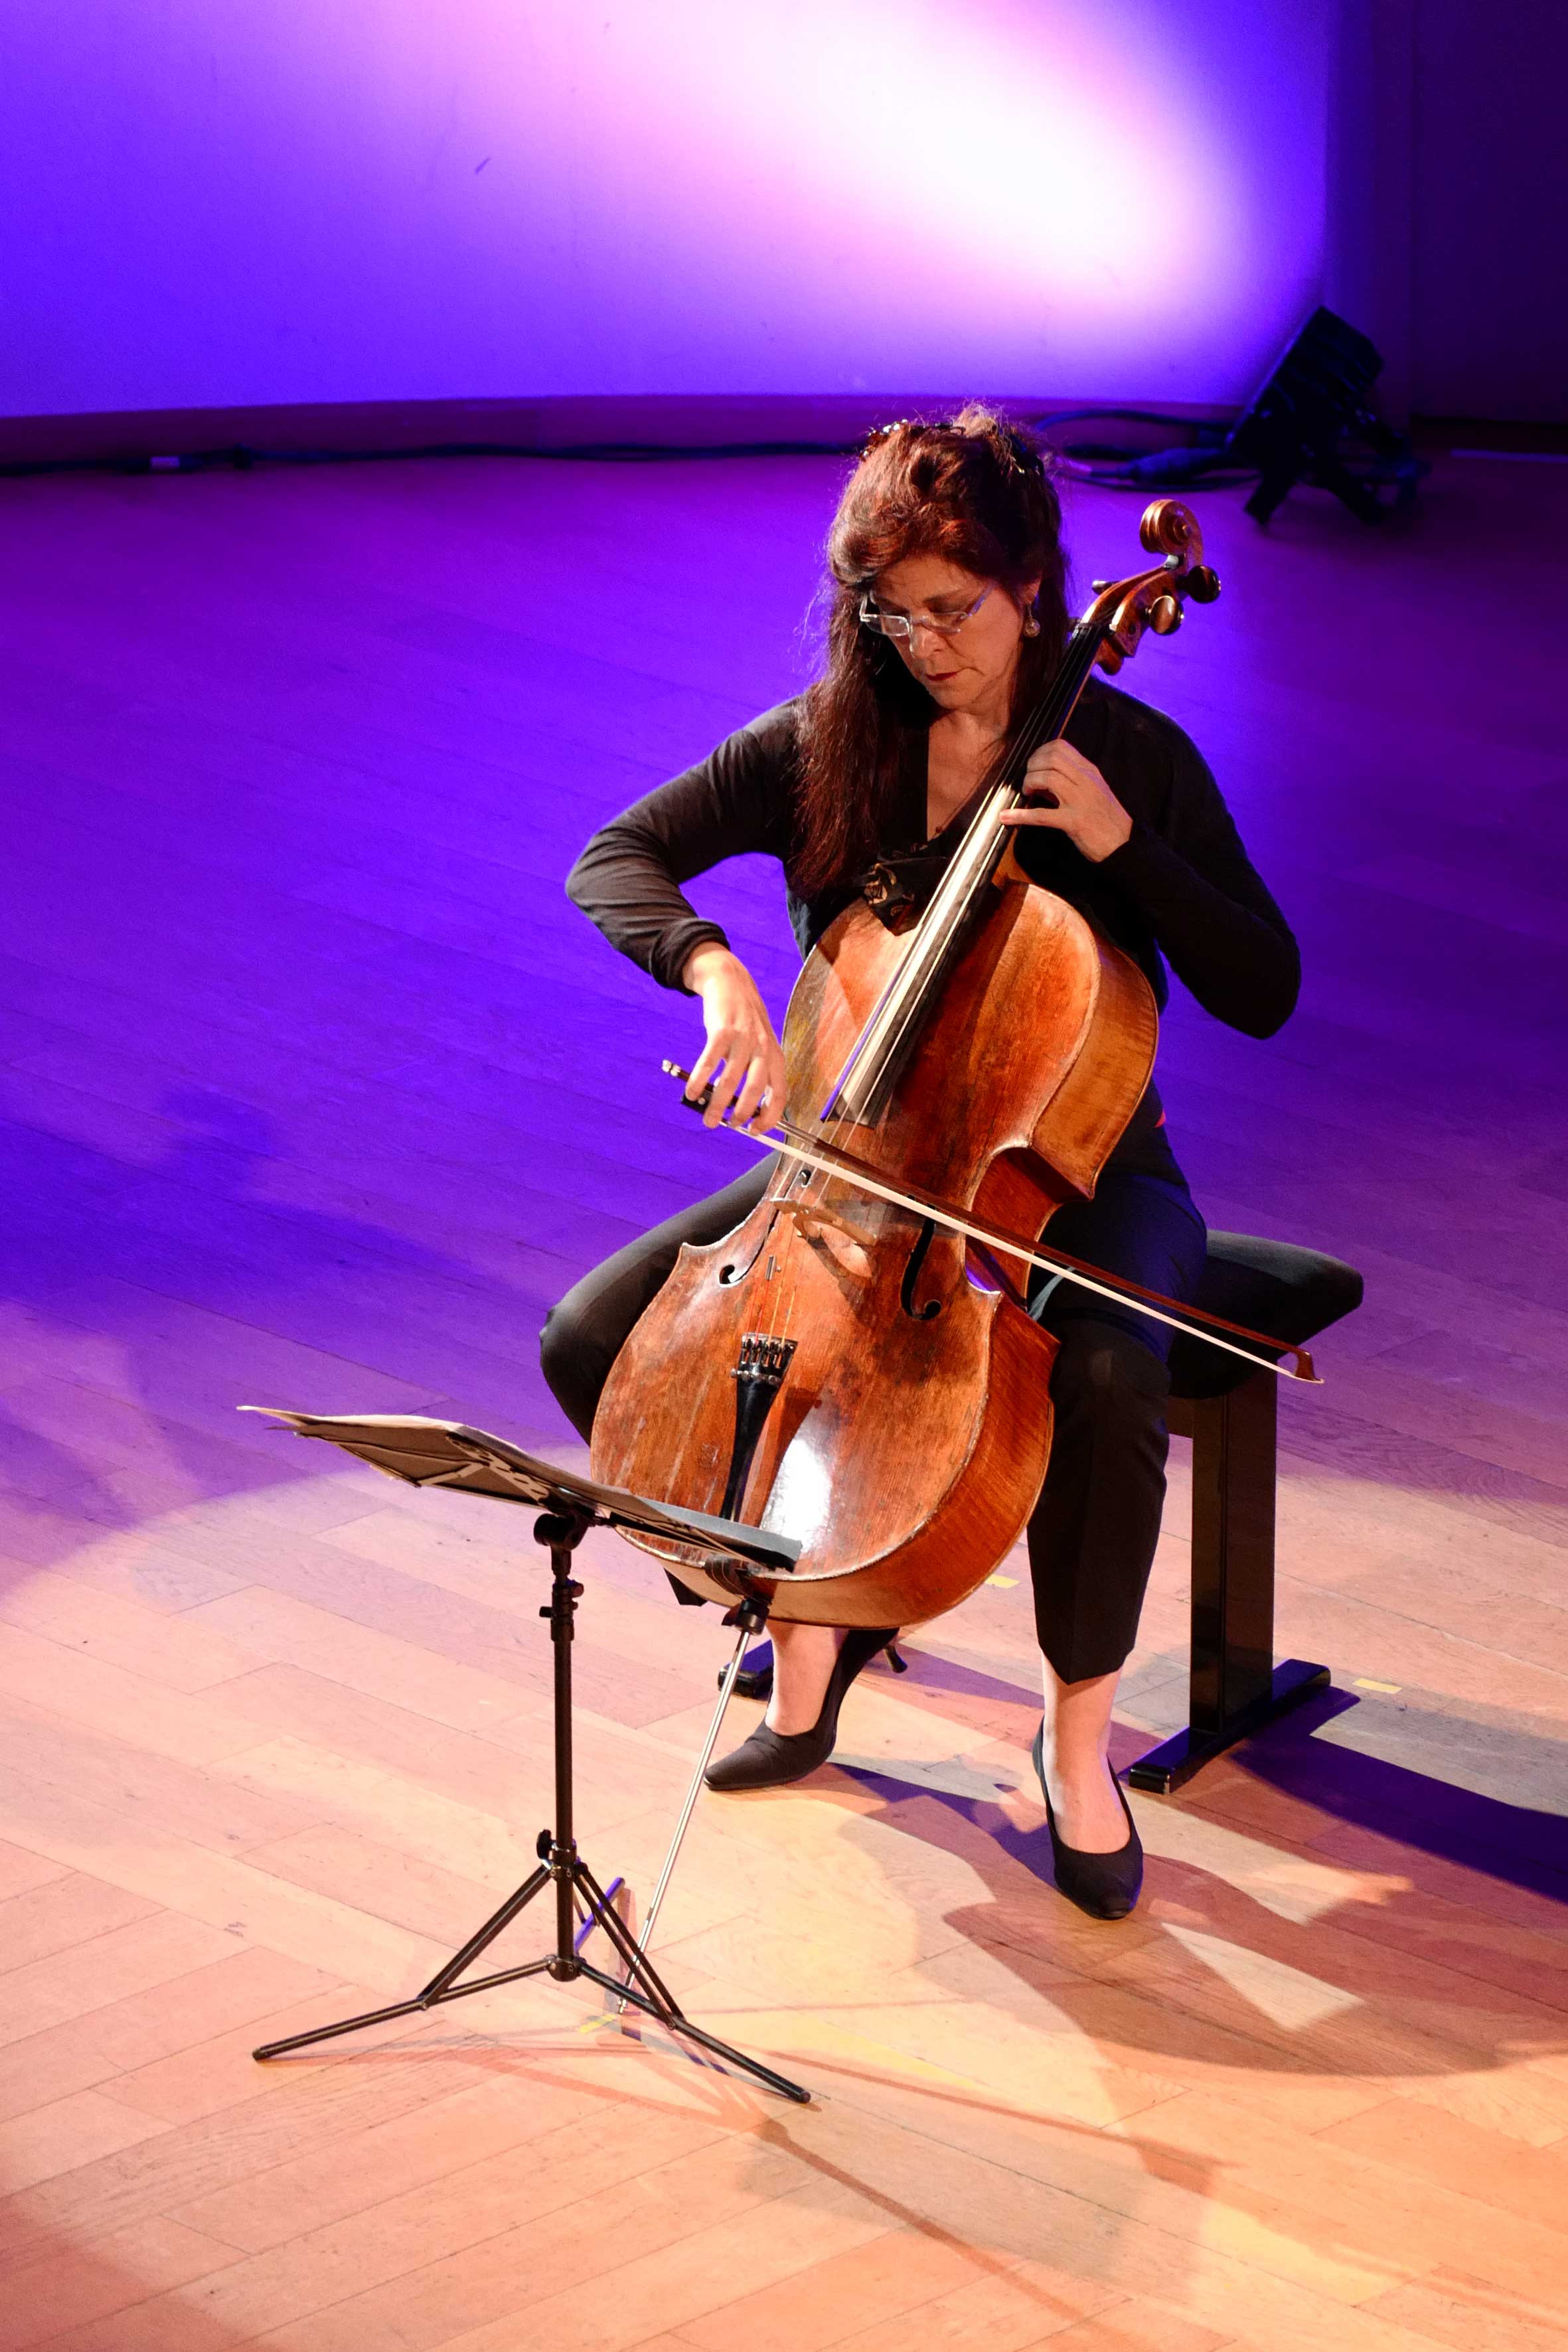 Sonia Wireder-Atherton au Festival Clef de Soleil